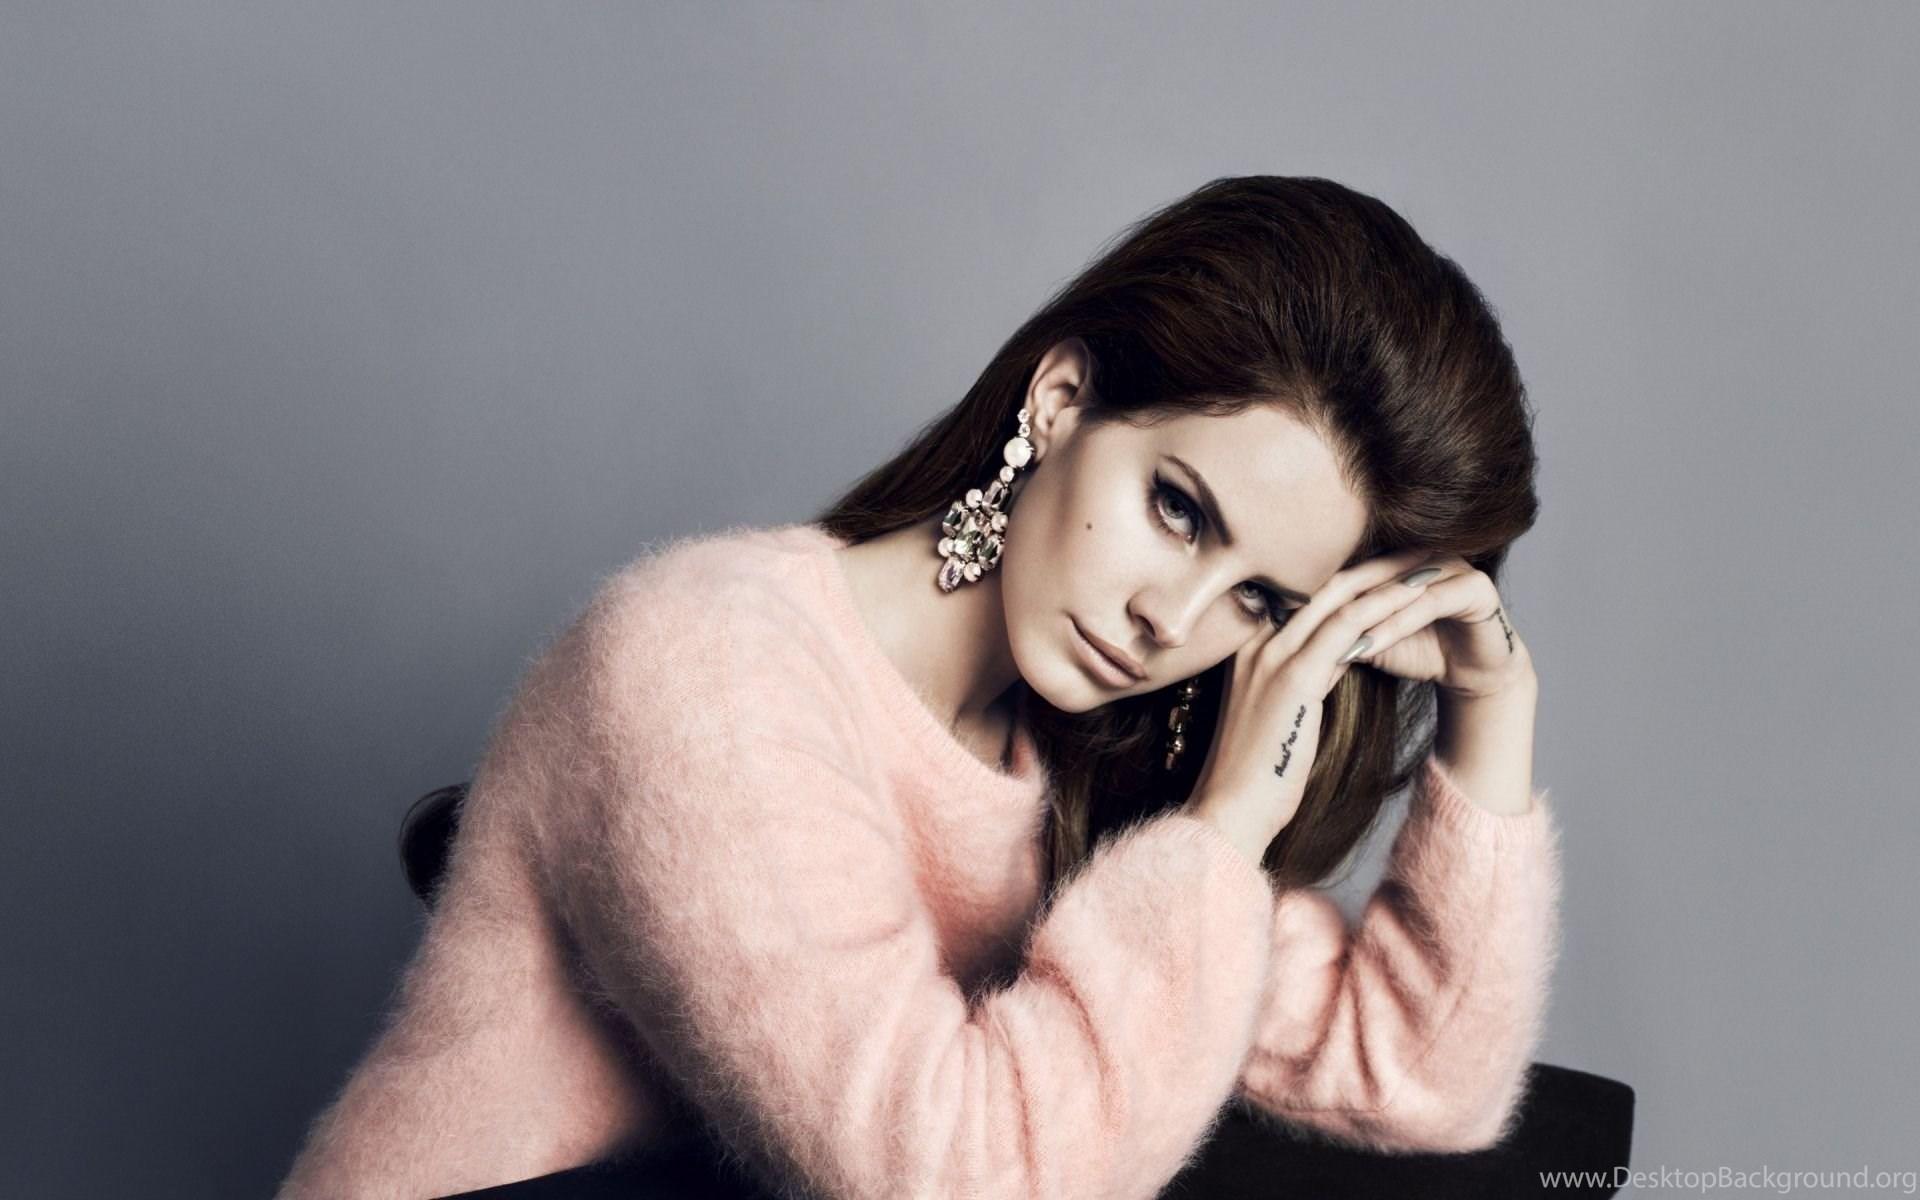 Wallpapers Hd Beautiful Lana Del Rey Hd Wallpapers Expert Desktop